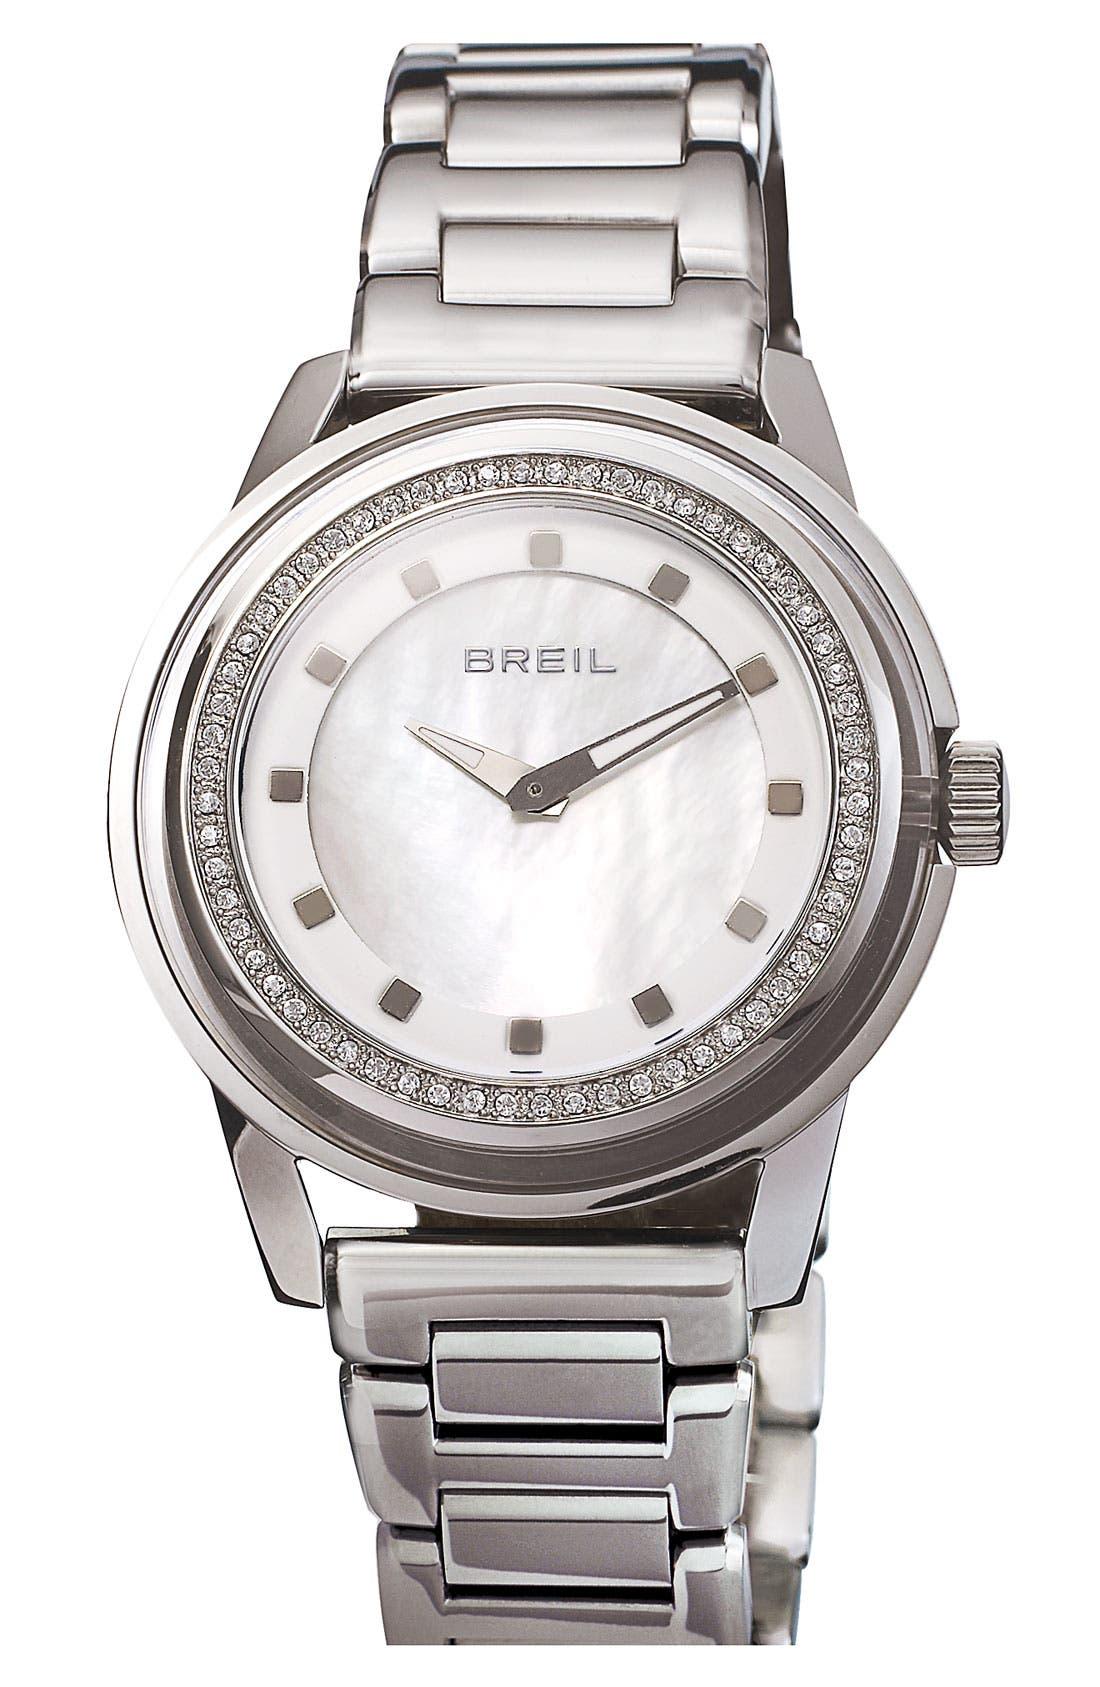 Main Image - Breil 'Orchestra' Crystal Bezel & Index Bracelet Watch, 40mm